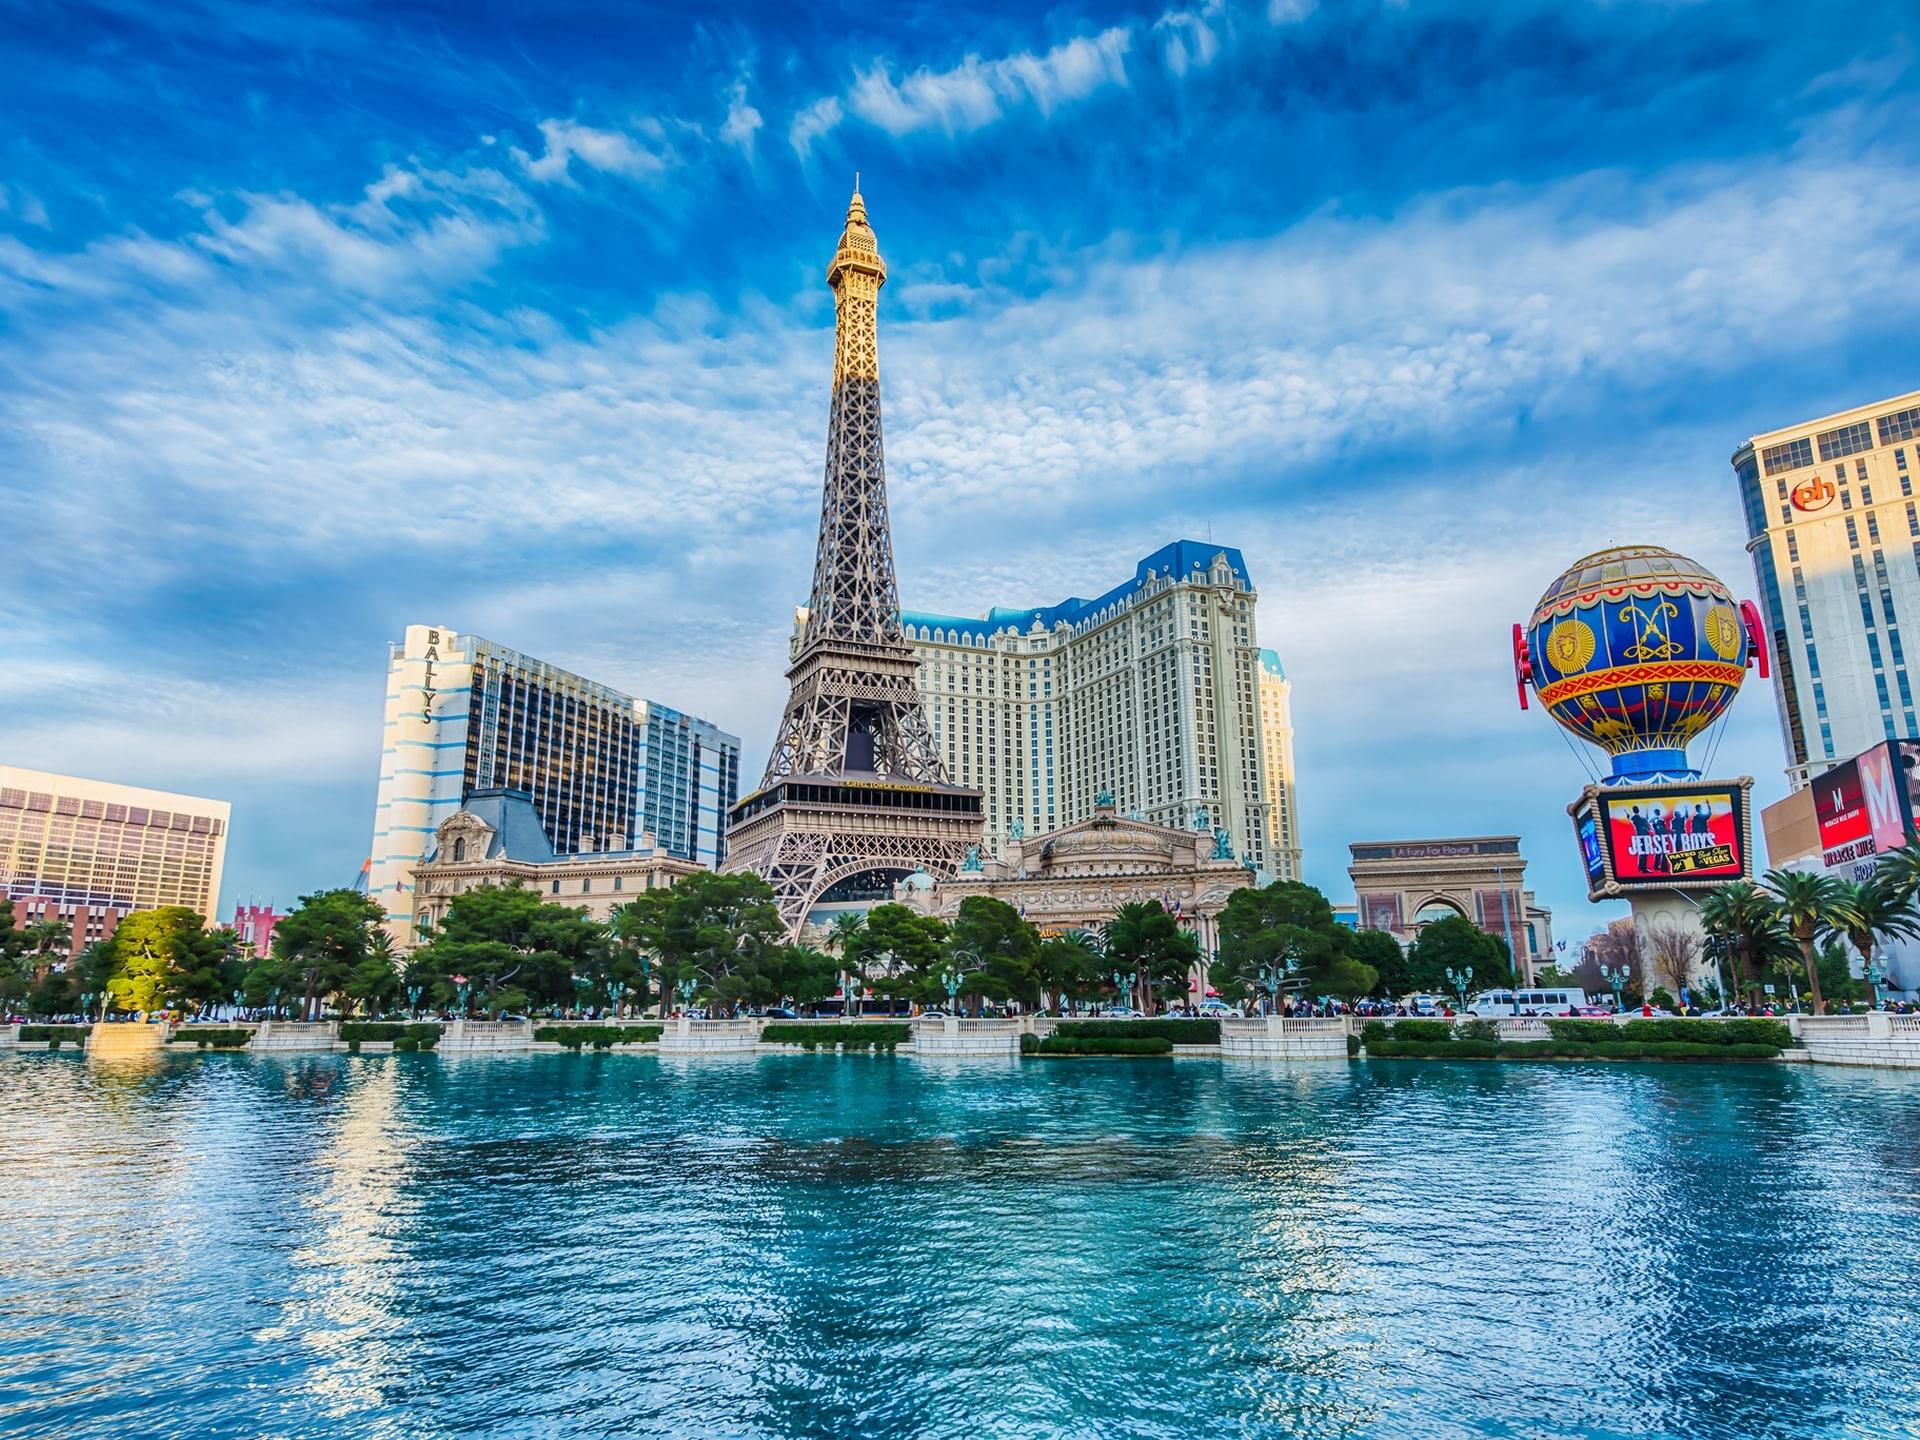 Las Vegas widescreen for desktop